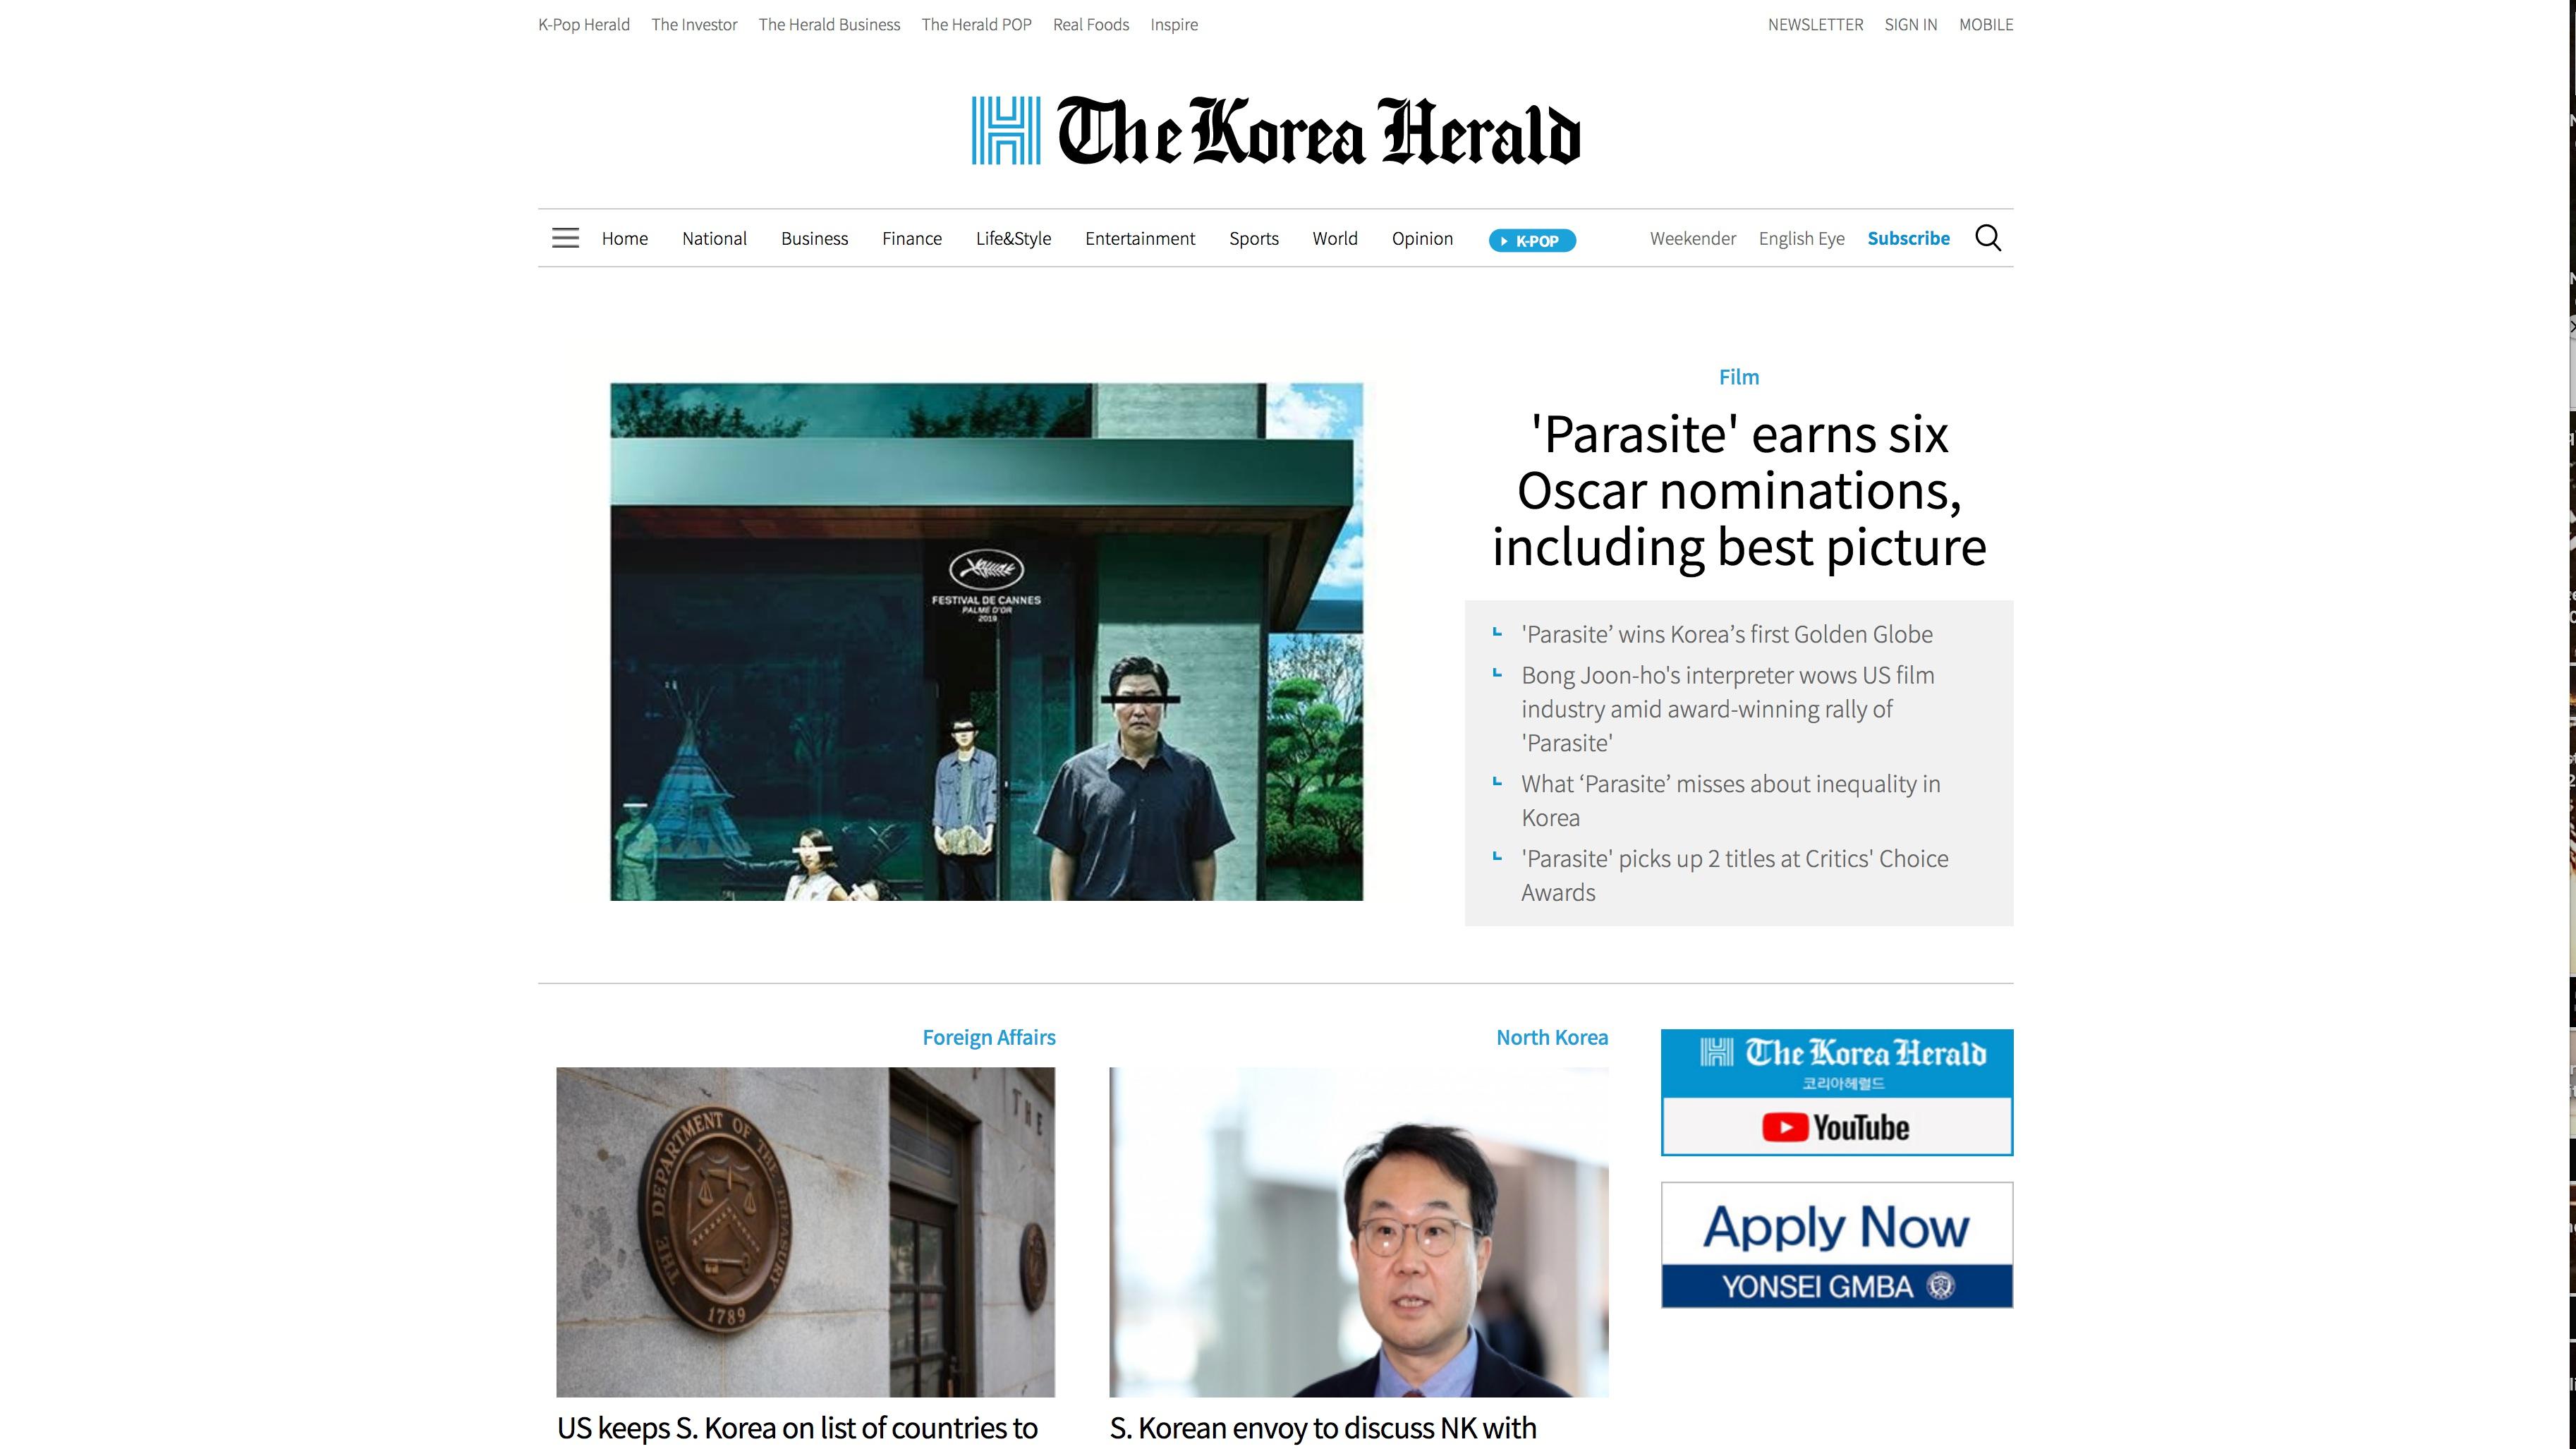 Korea Herald celebrates Parasite